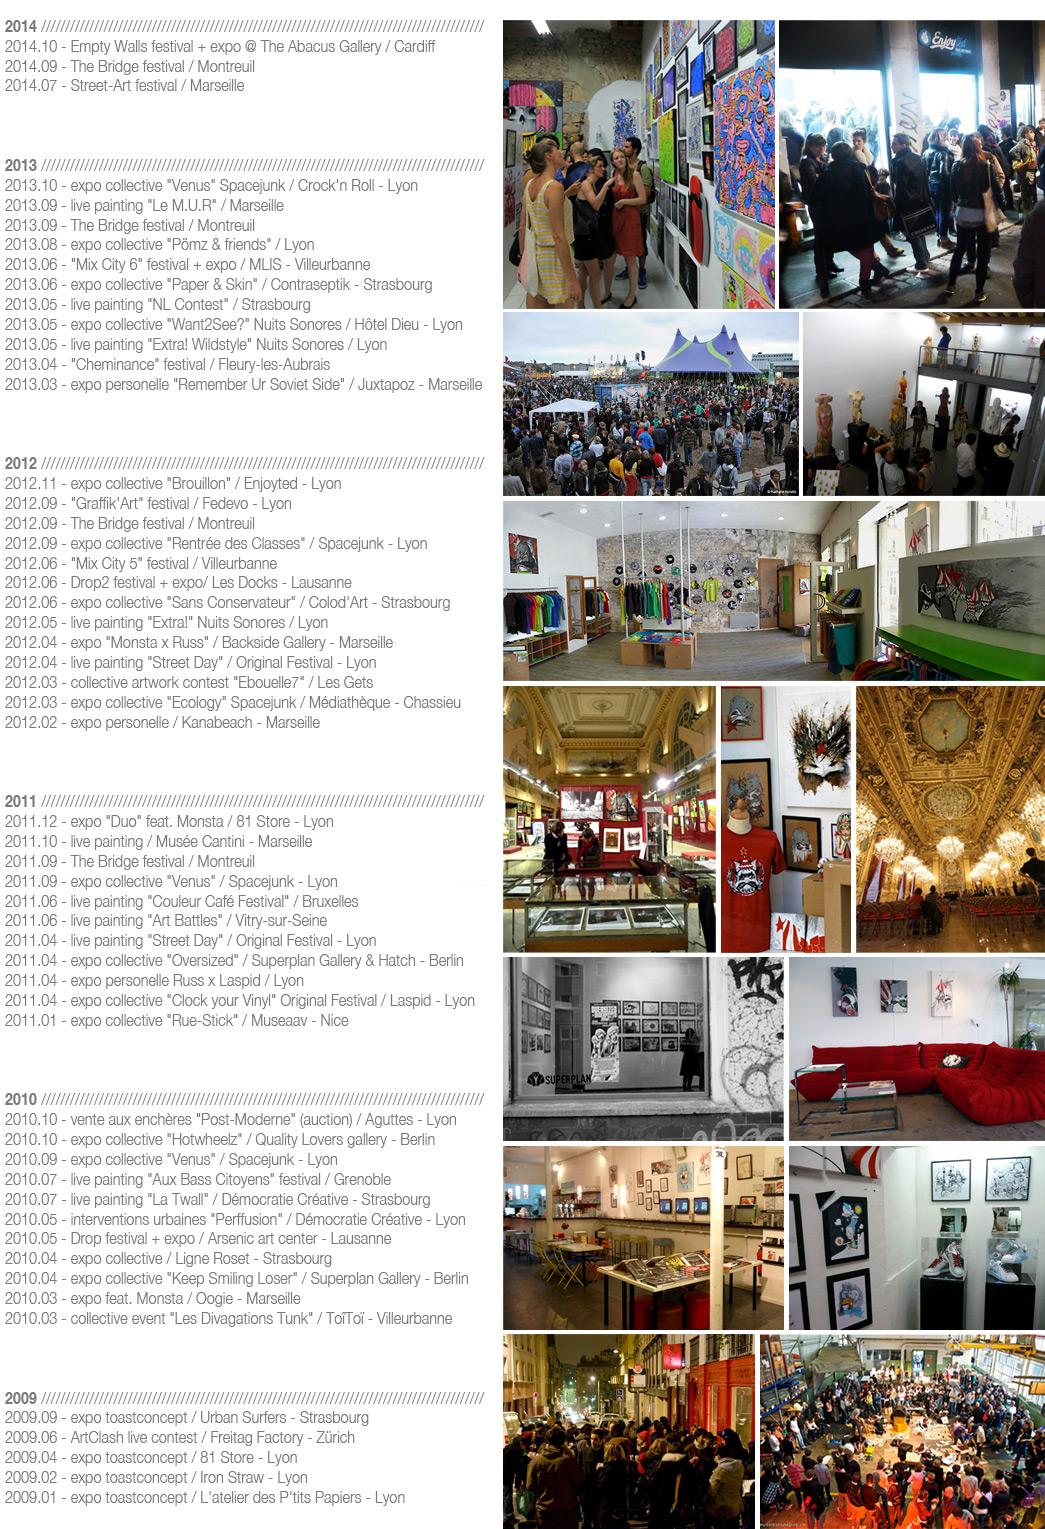 expos-archive-Ok2014